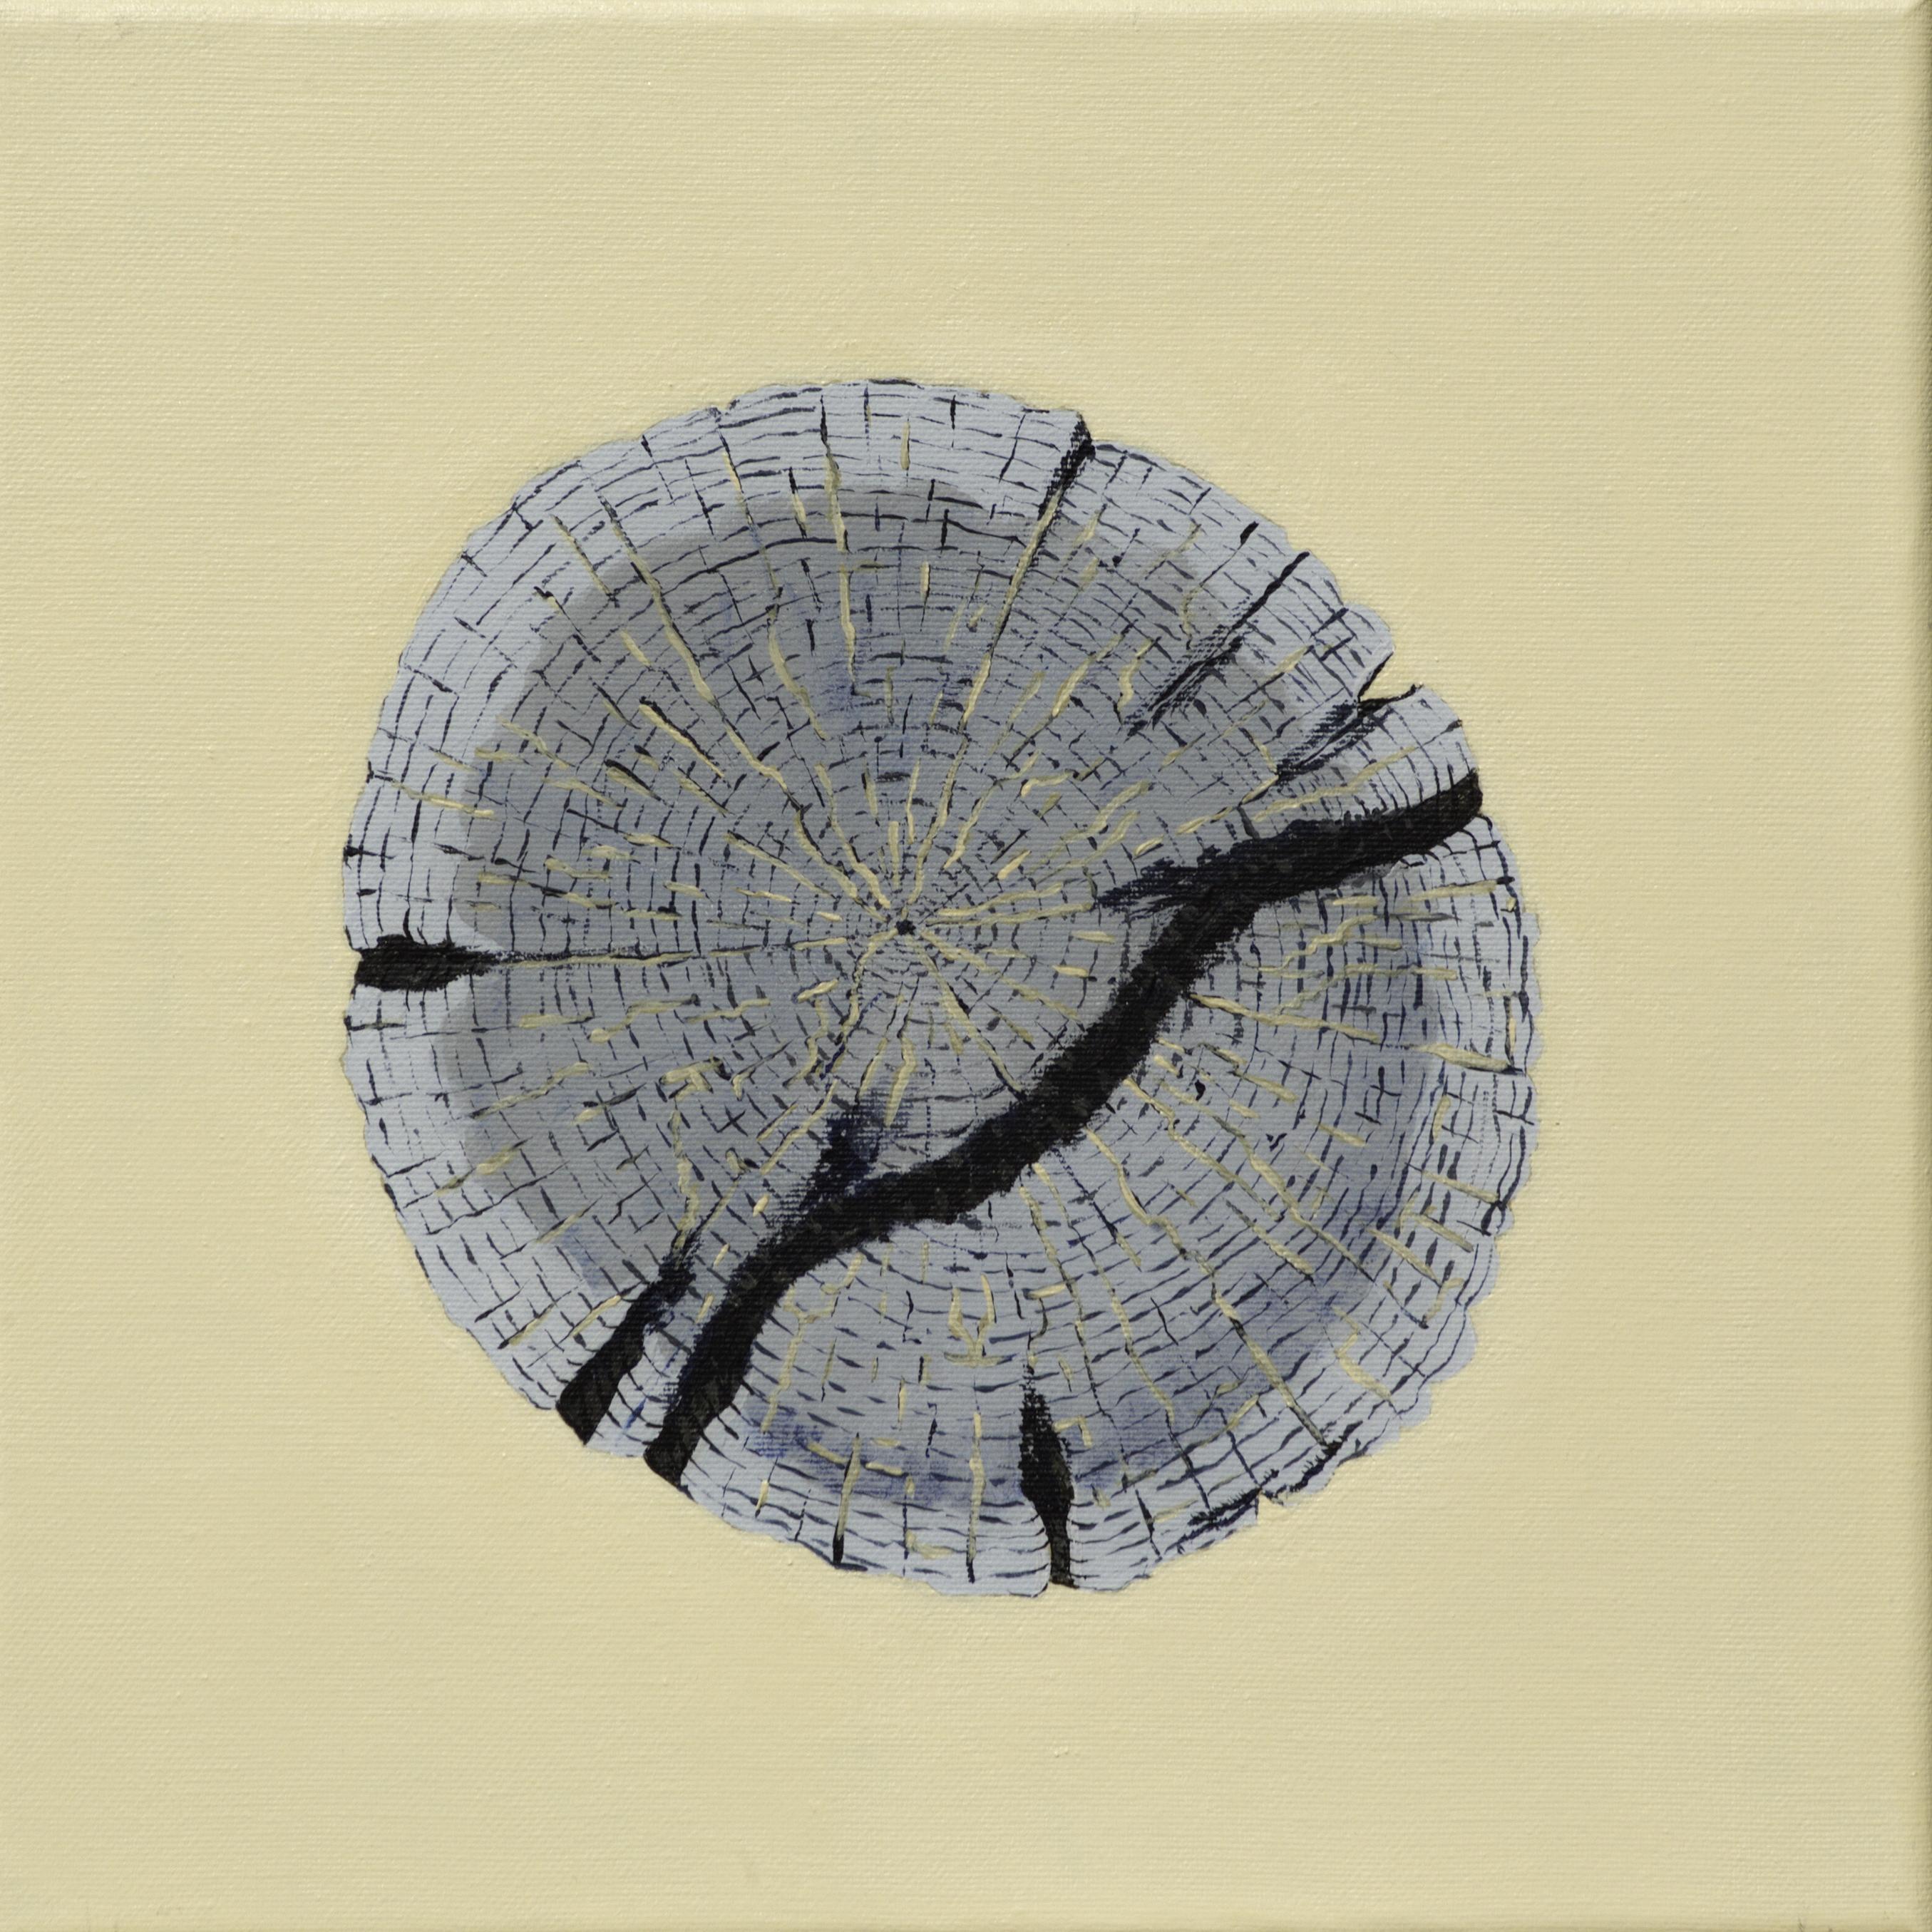 Paalkop 4 - acryl op canvas - 30 x 30 cm